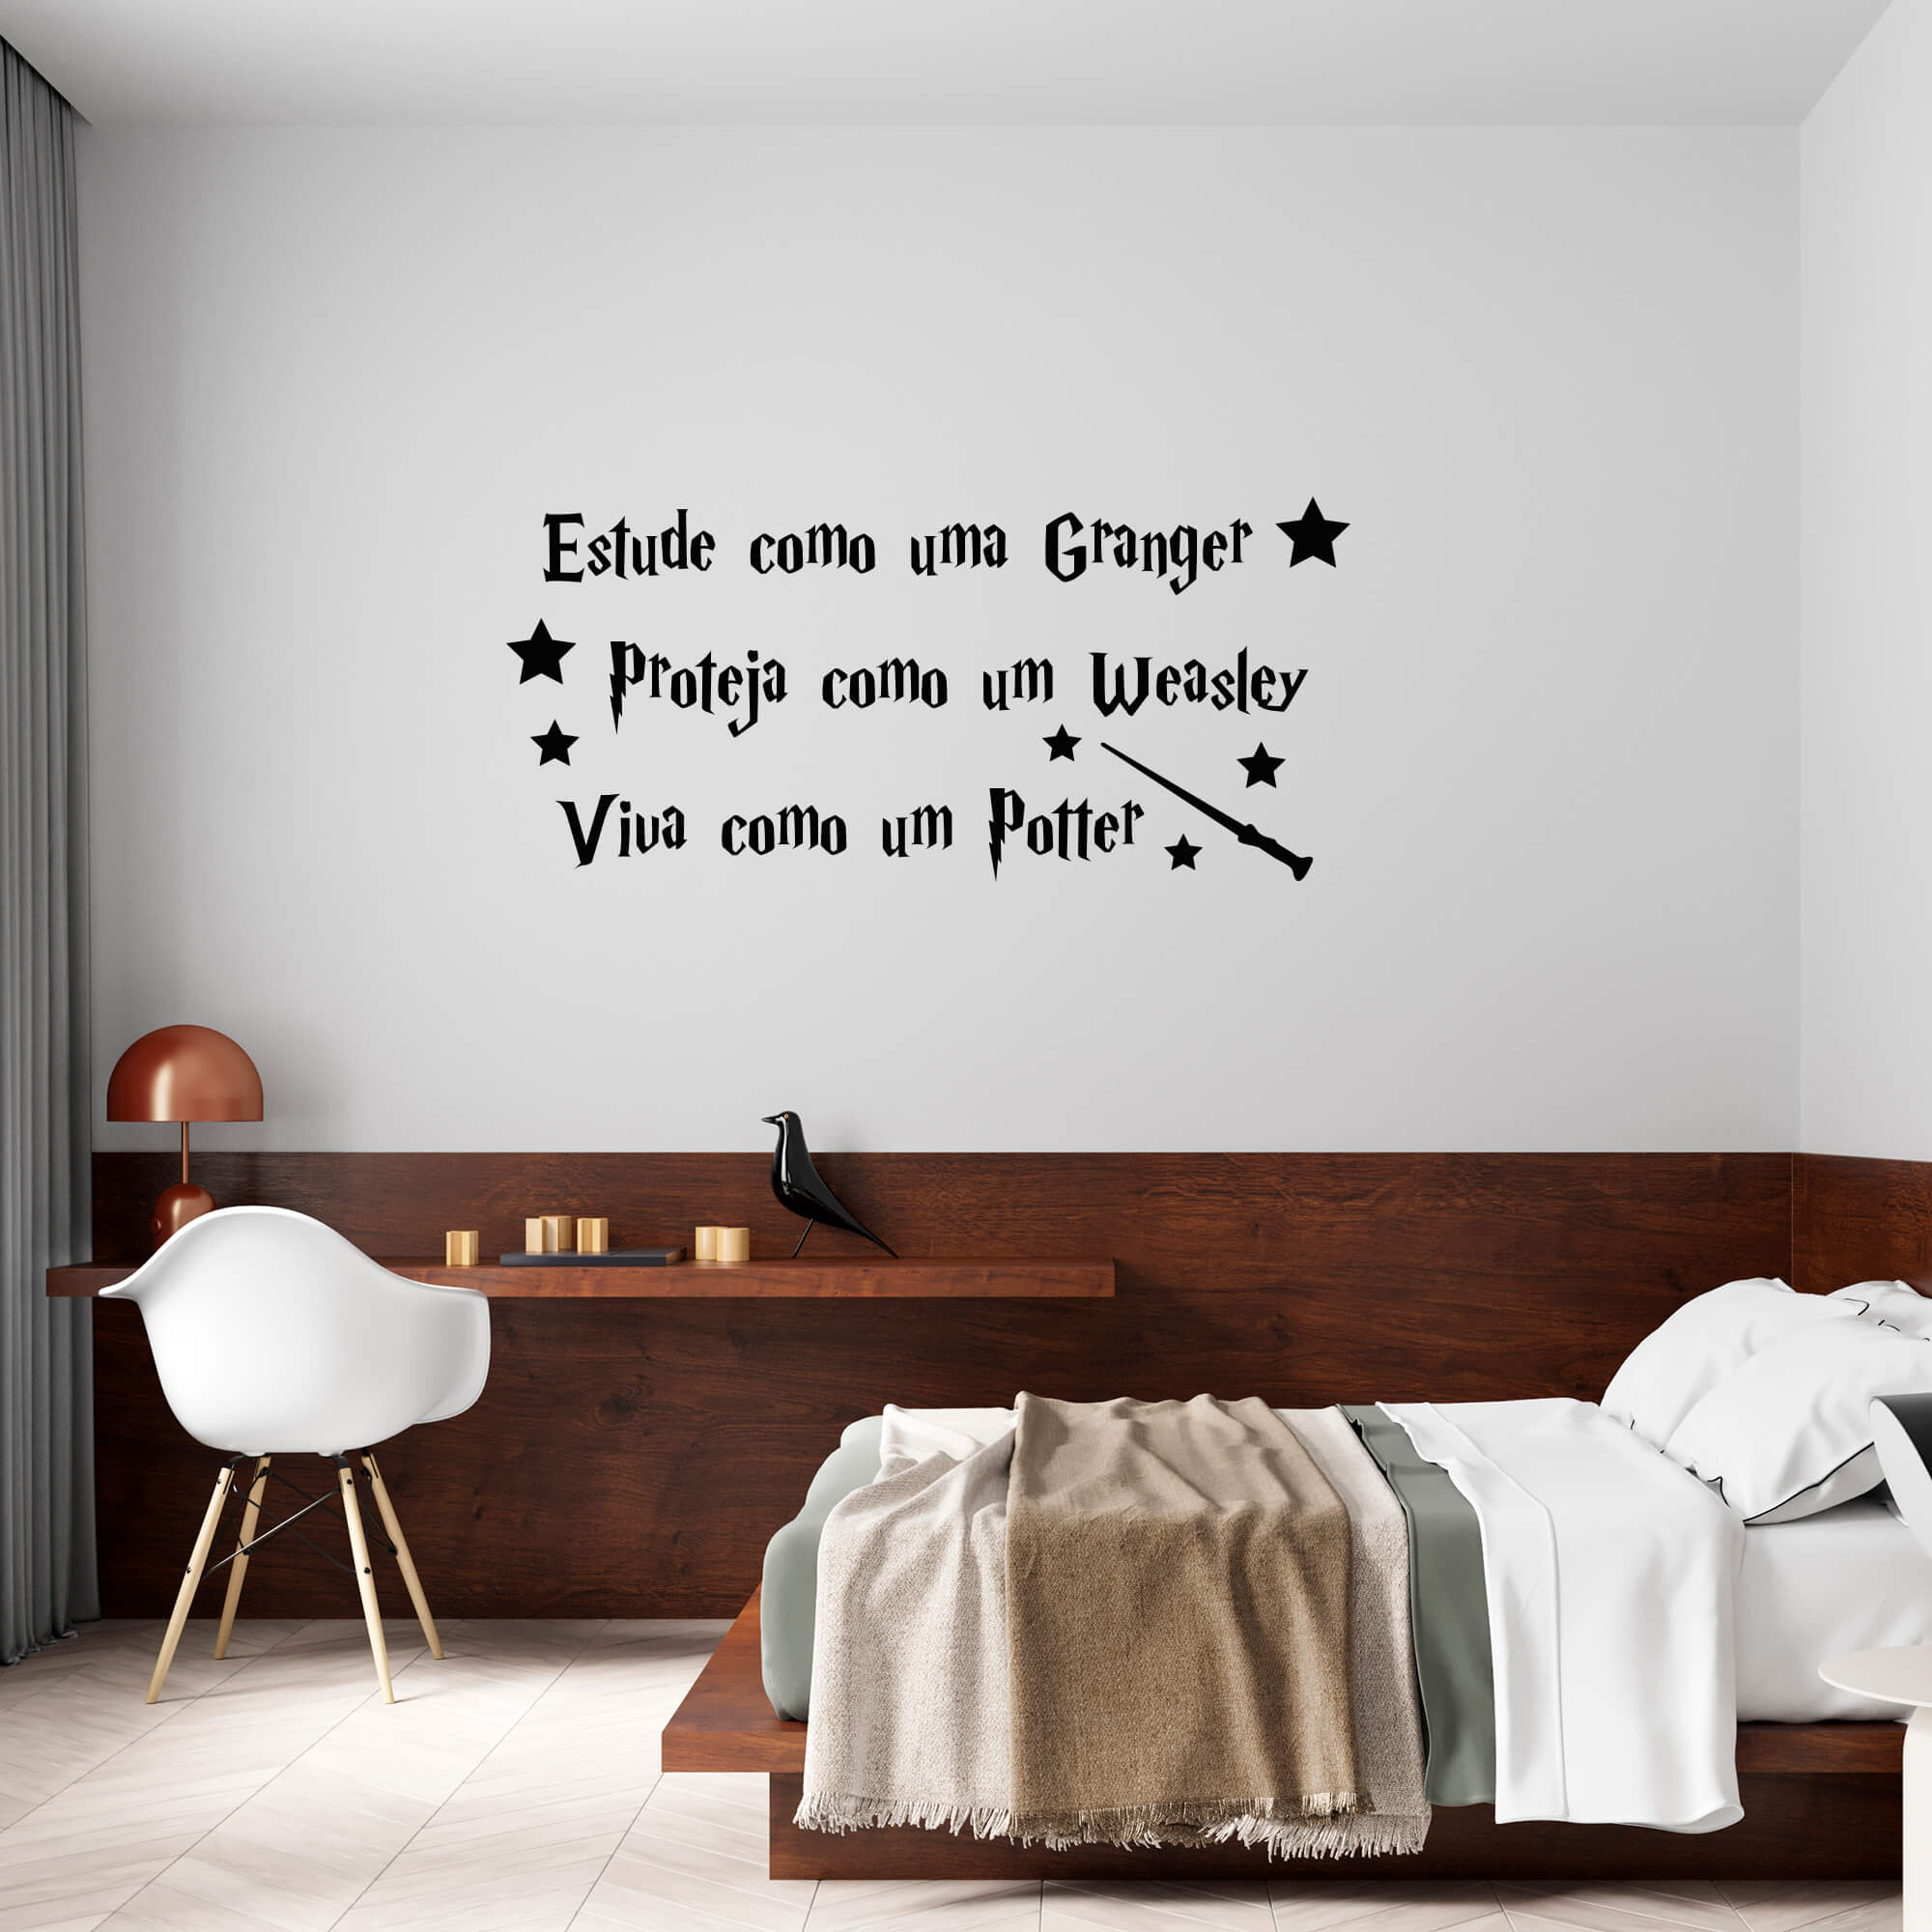 Adesivo Decorativo Frase Viva Como Um Potter Hogawarts Harry Potter Weasley Granger